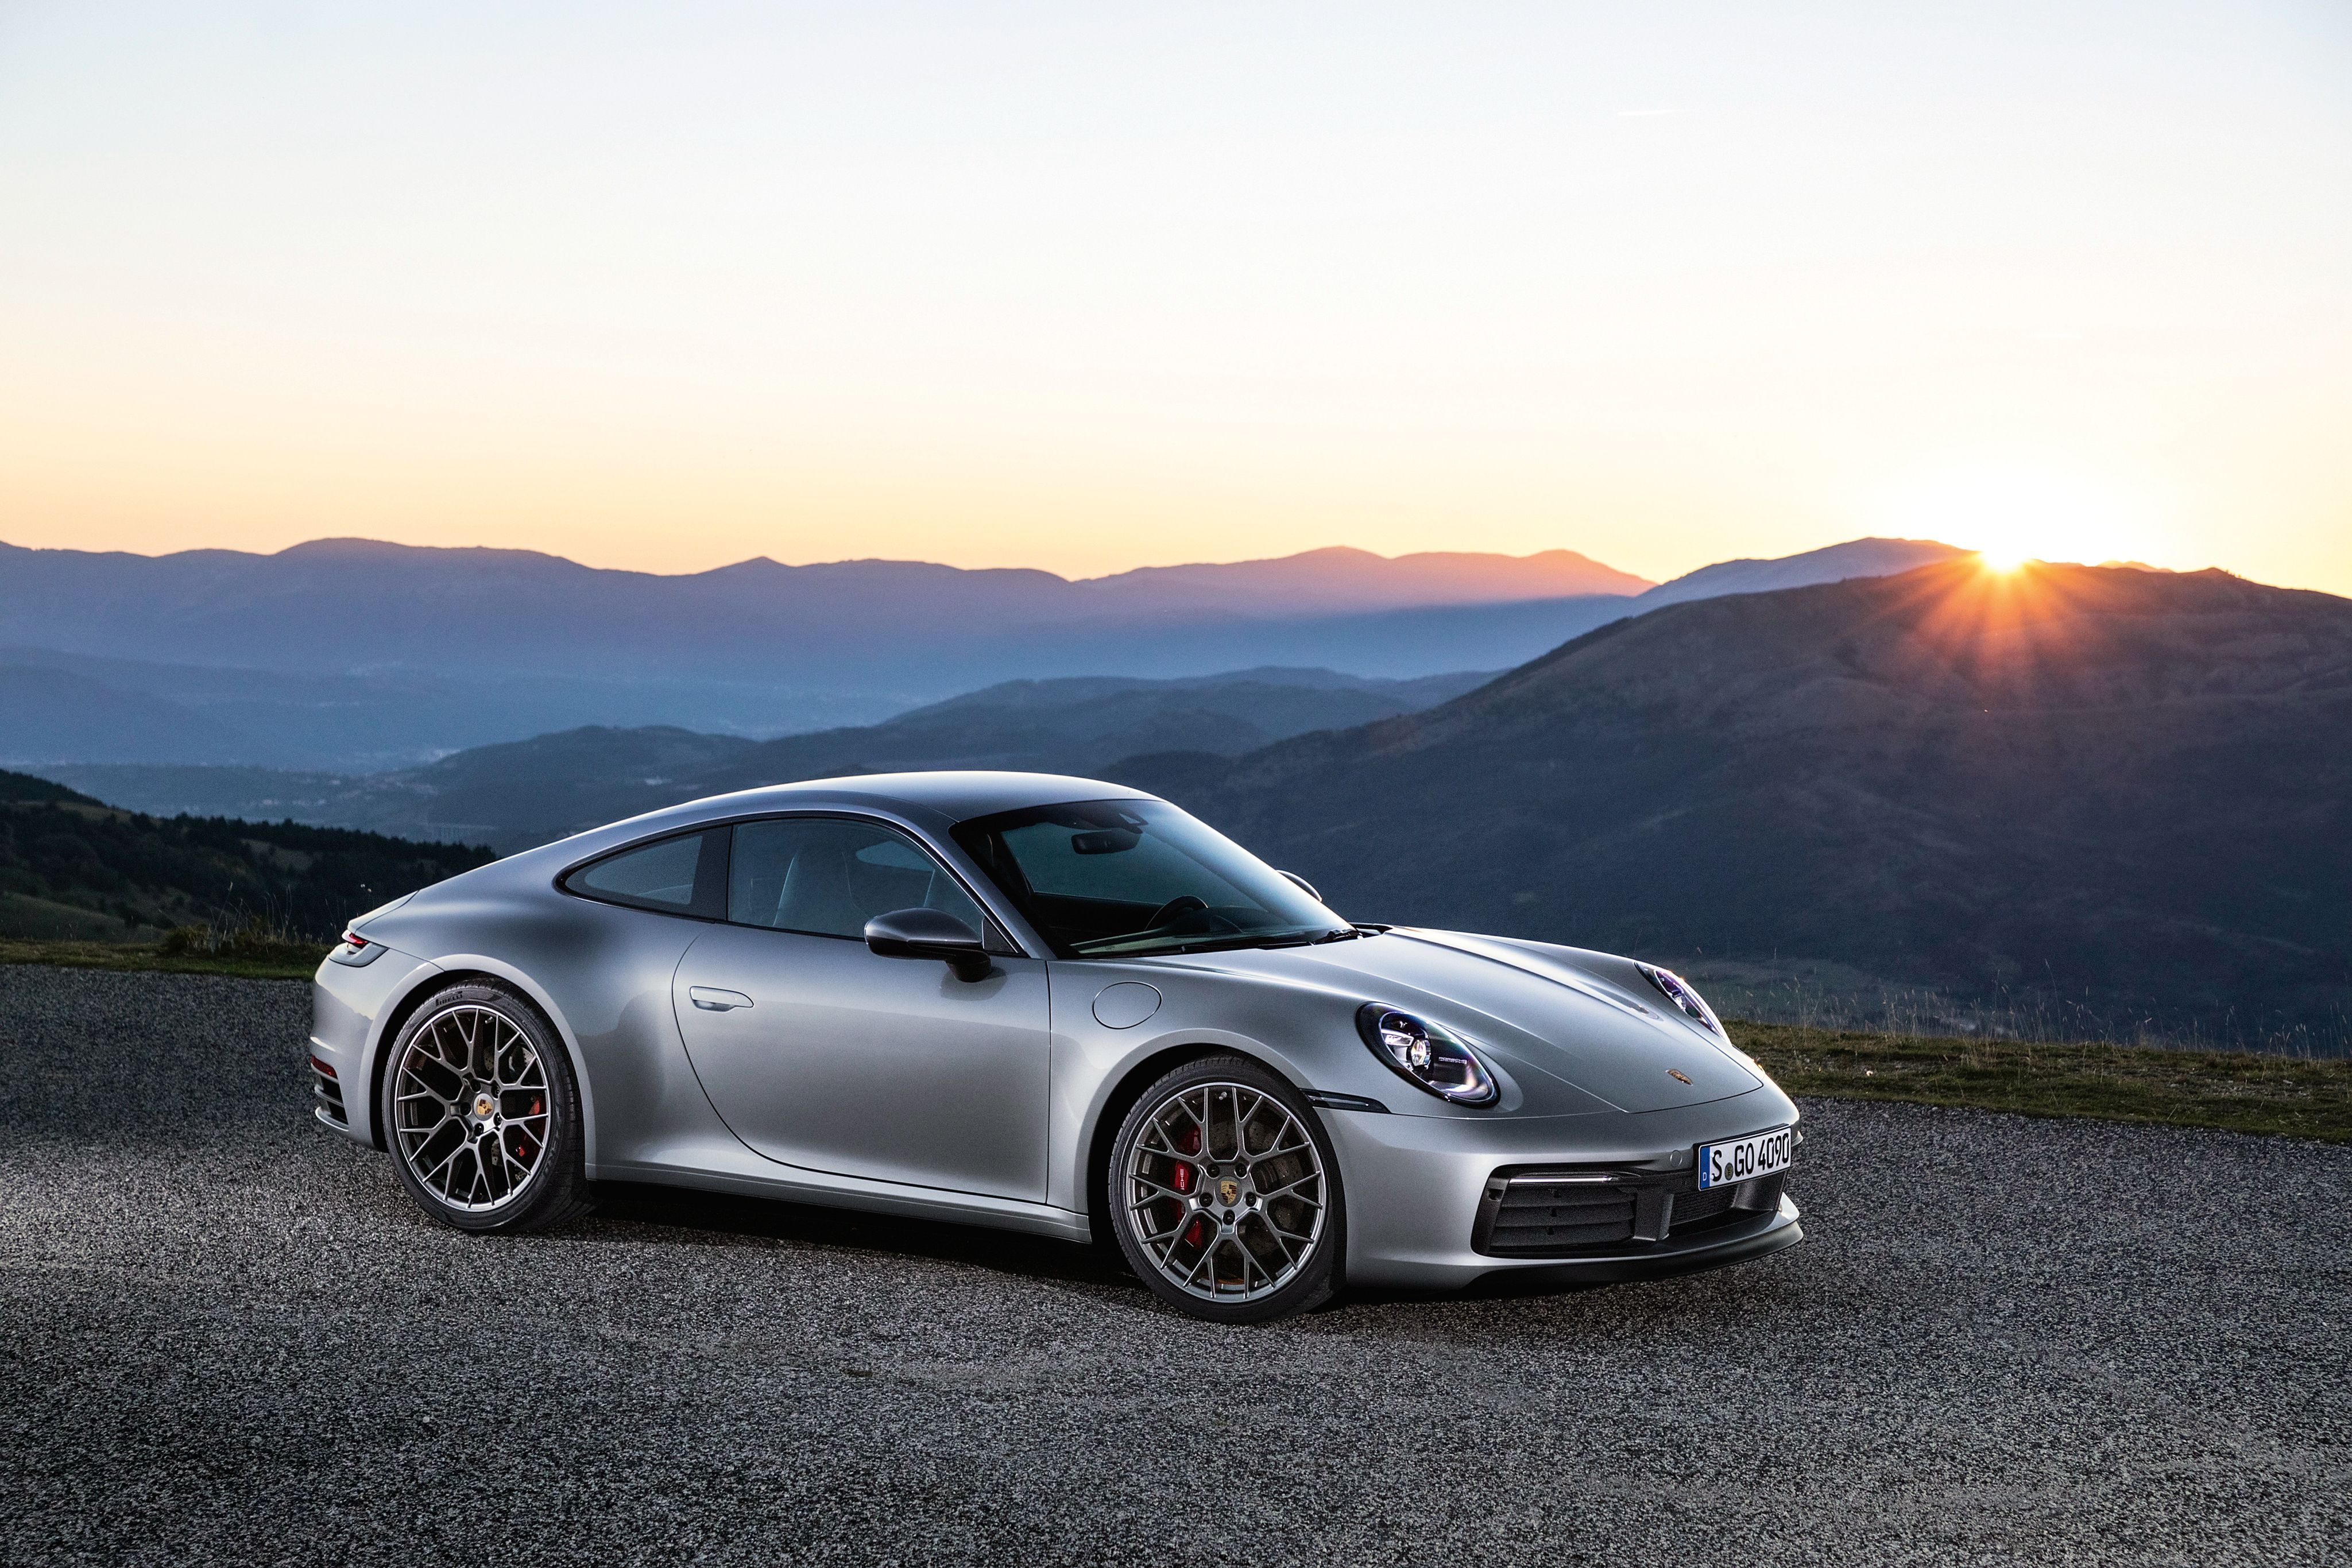 2019 992 Carrera 4s Porsche 911 New Porsche Porsche Cars